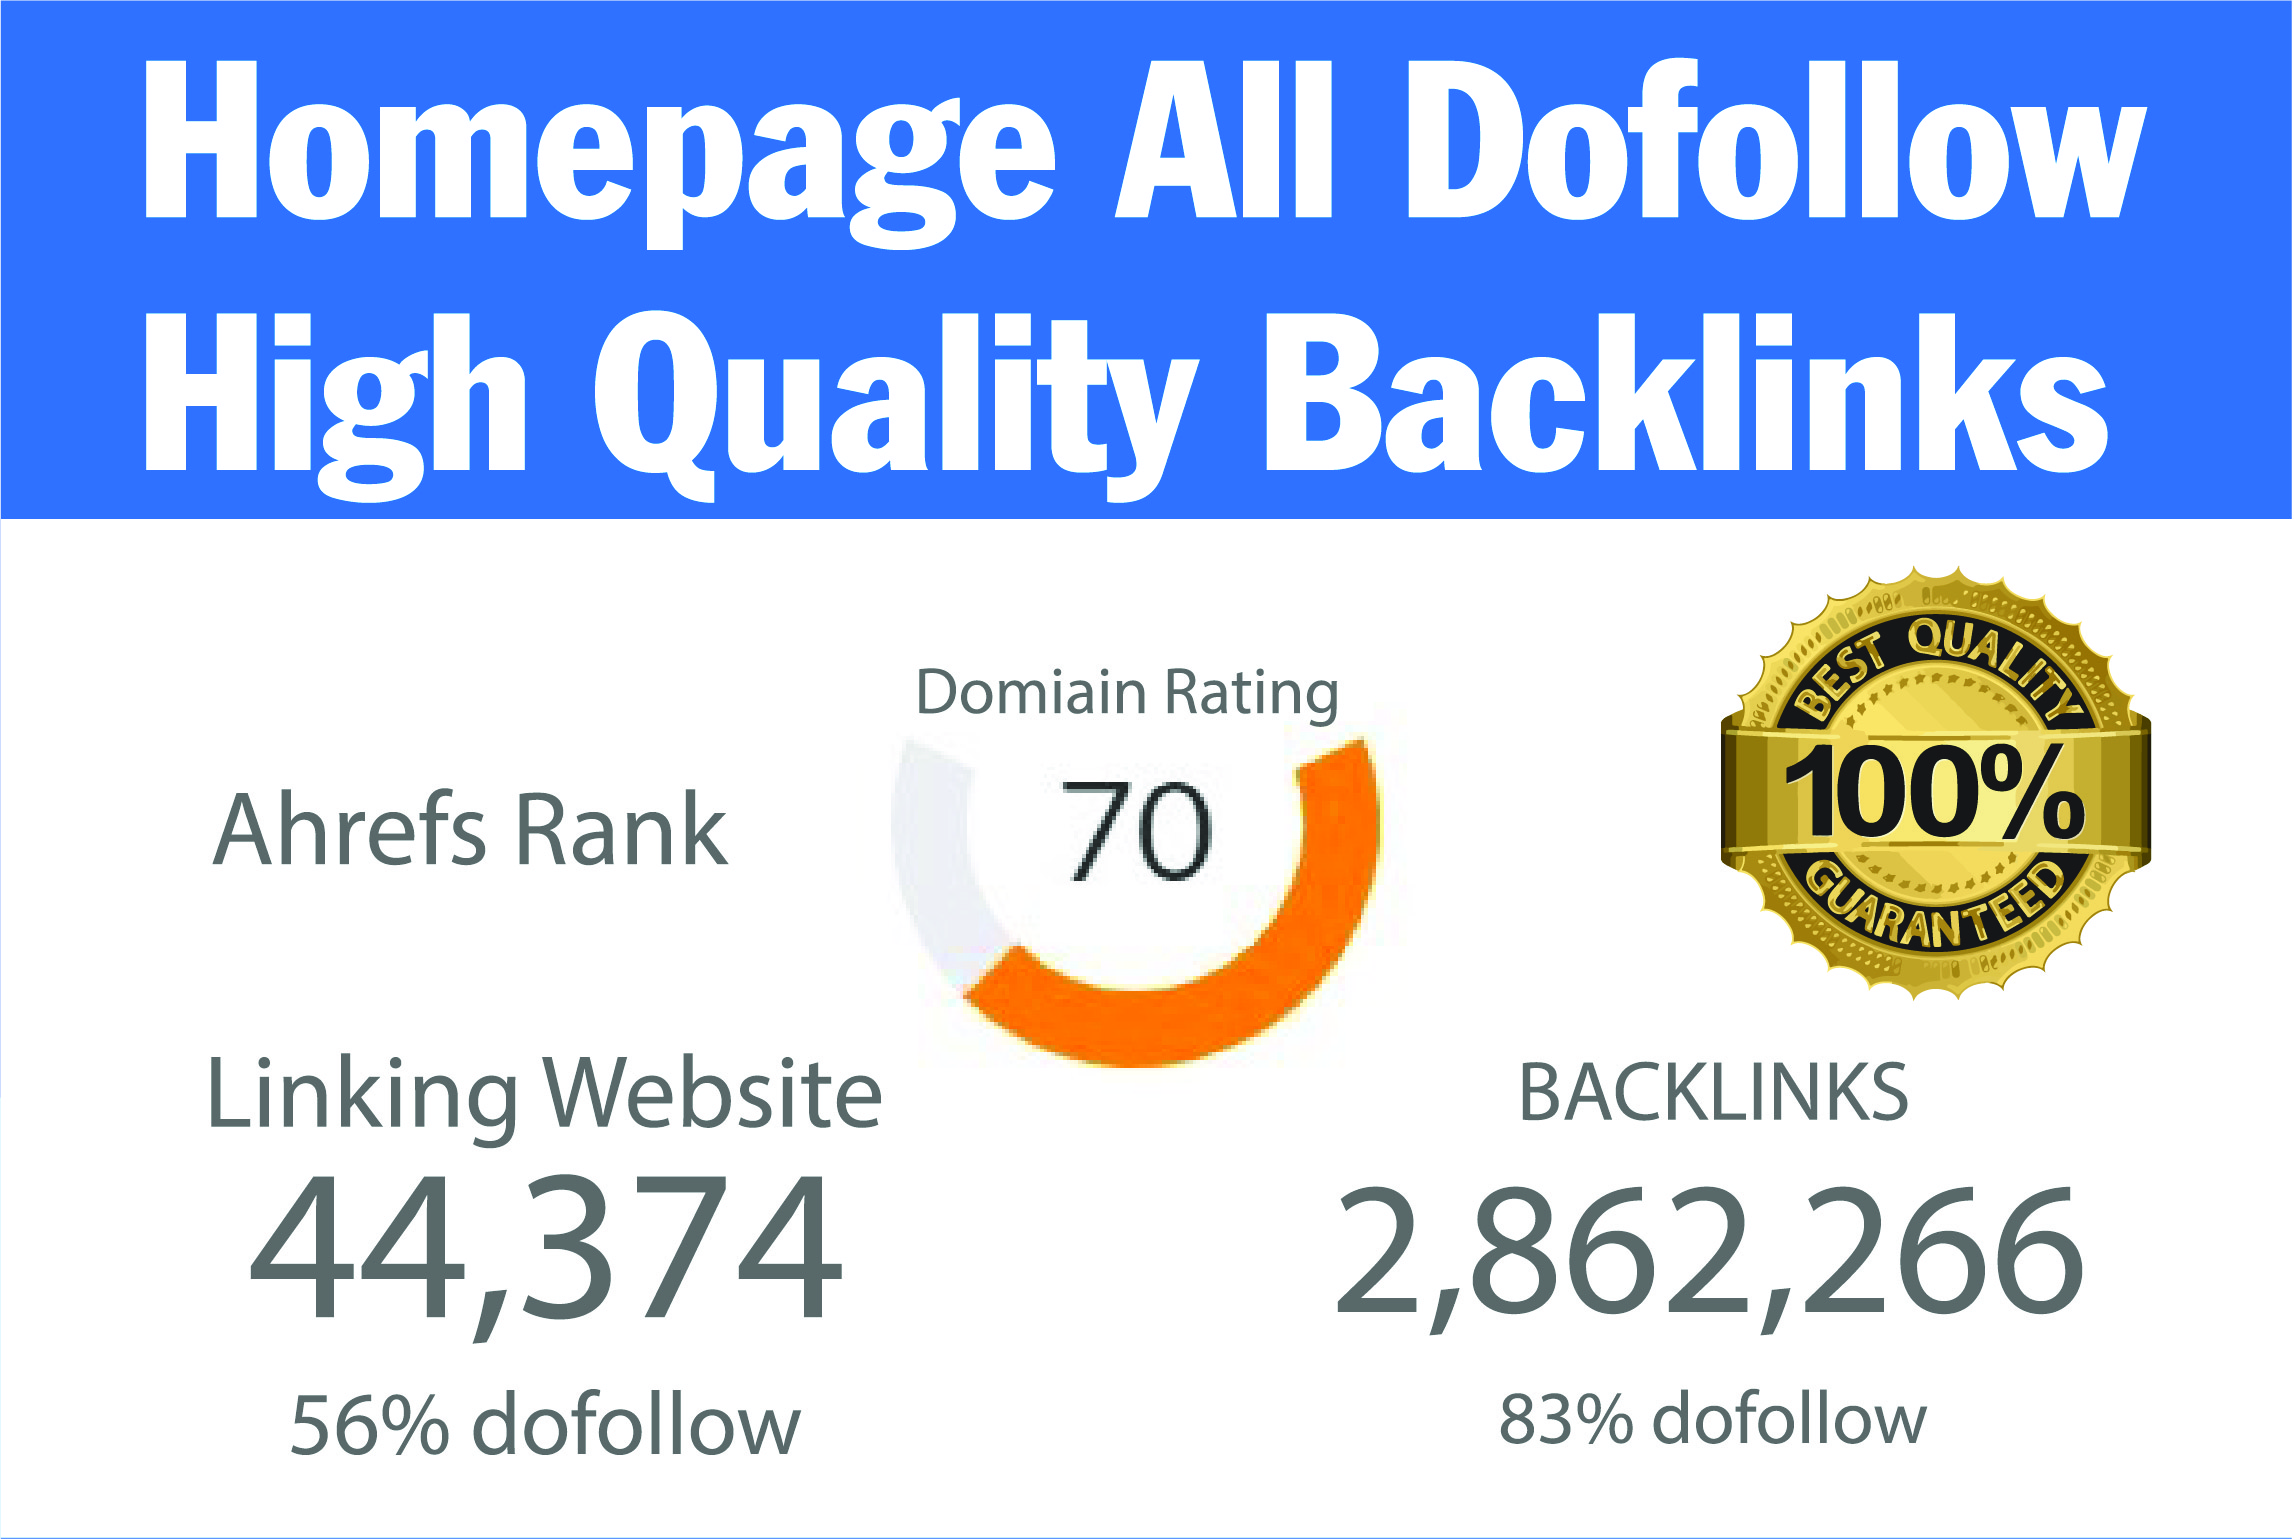 Create 20 Backlinks DR 70 permanent dofollow backlinks for your website